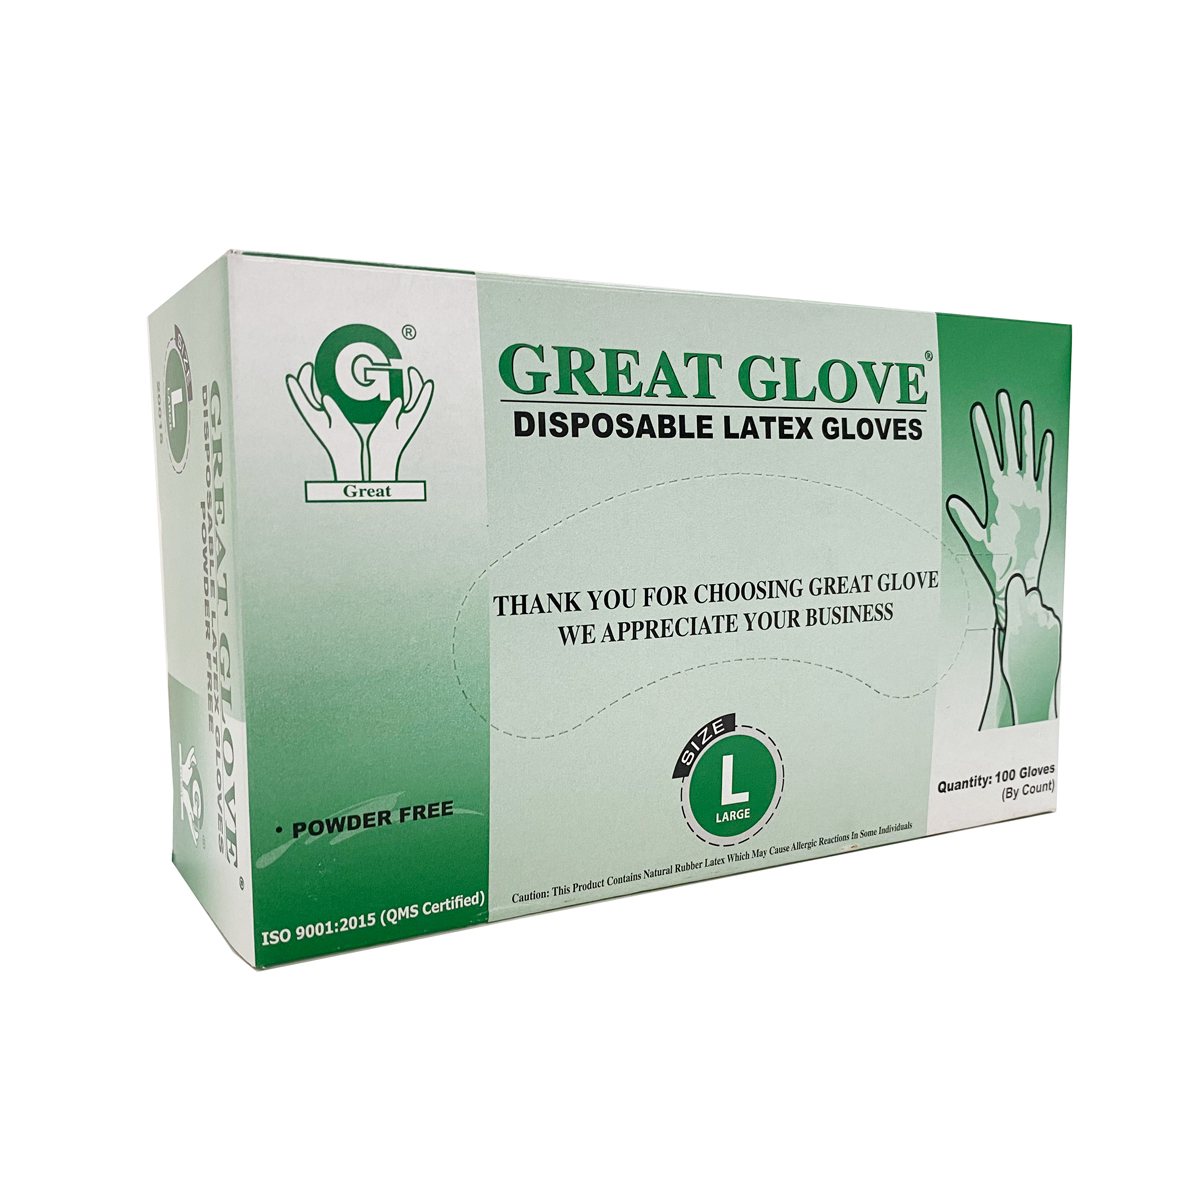 L Nitrile Gloves Latex Vinyl Powder Free Sizes: XS M S XL